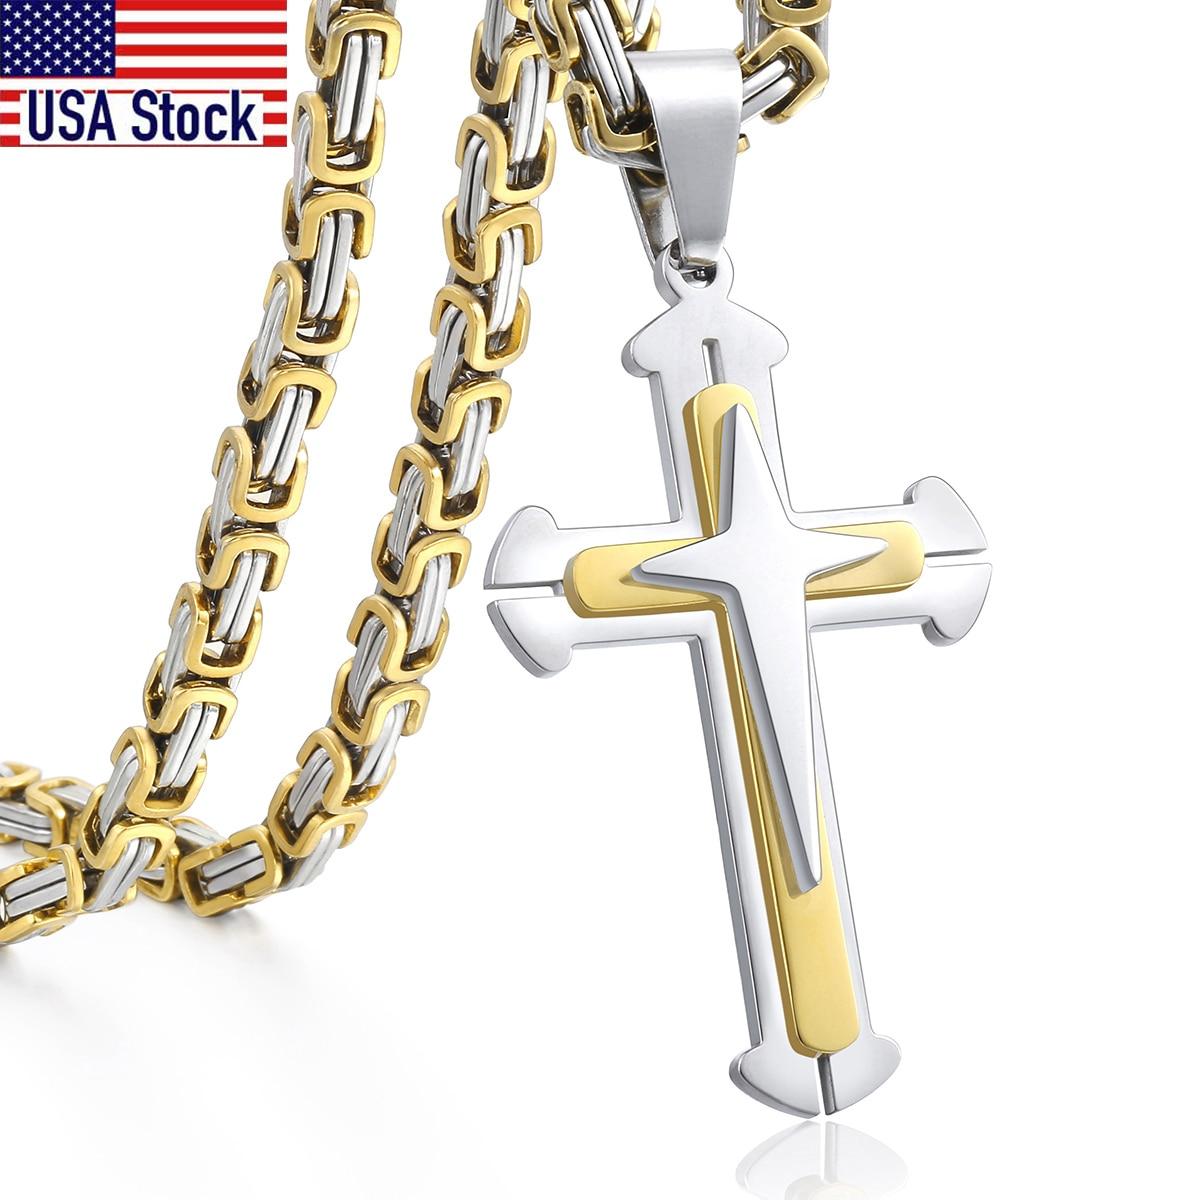 Men's Cross Necklace Gold Black Cross Pendant Stainless Steel Byzantine Chain Necklace 2018 Hip Hop Male Jewelry KP180|byzantine chain|cross pendantchain gold - AliExpress